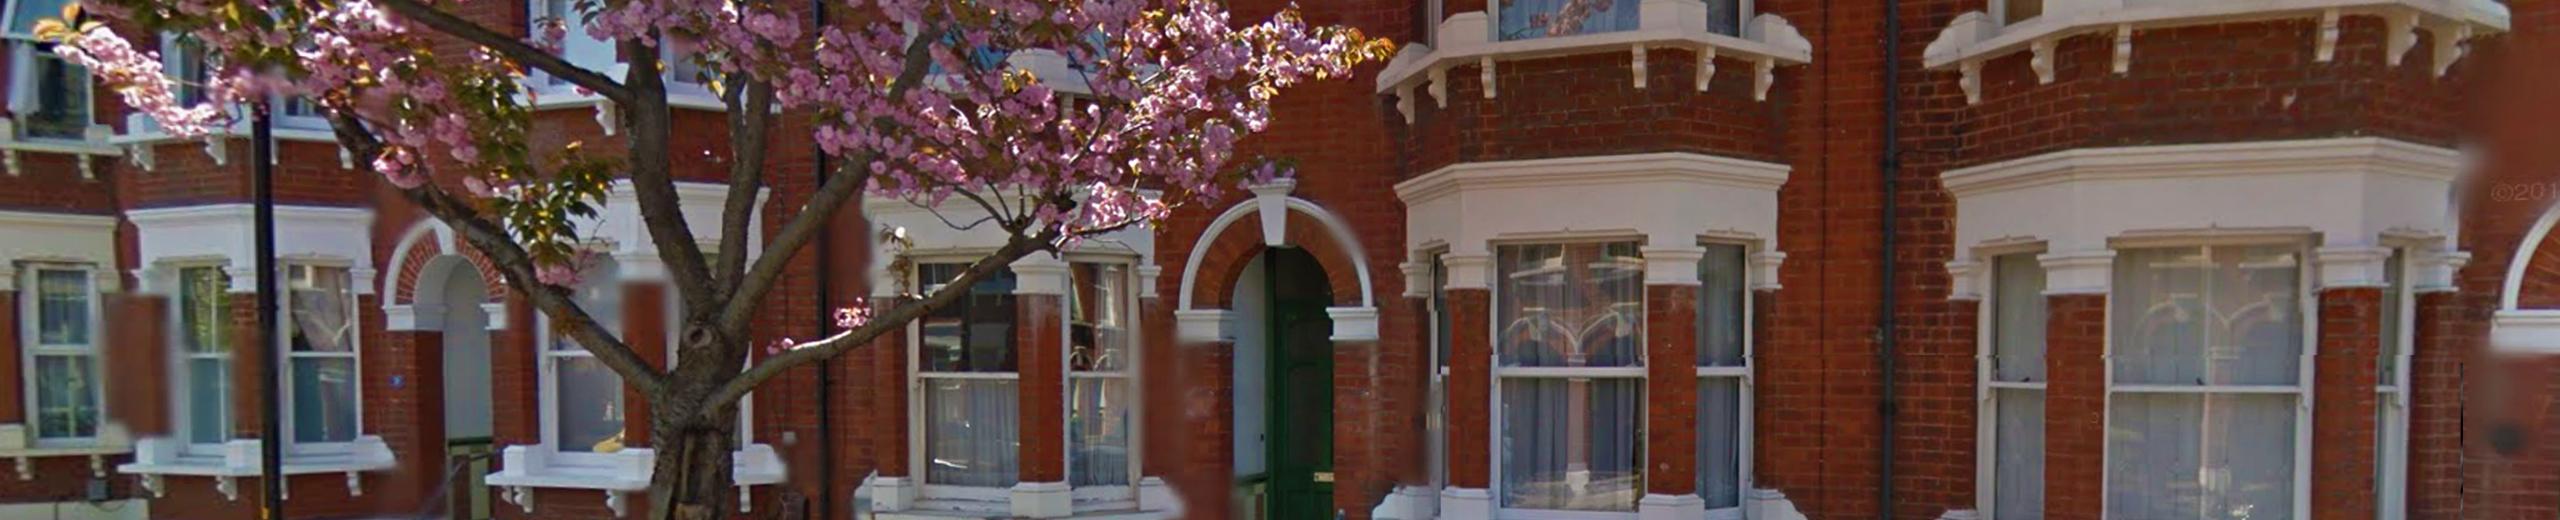 South East London Psychoanalyst